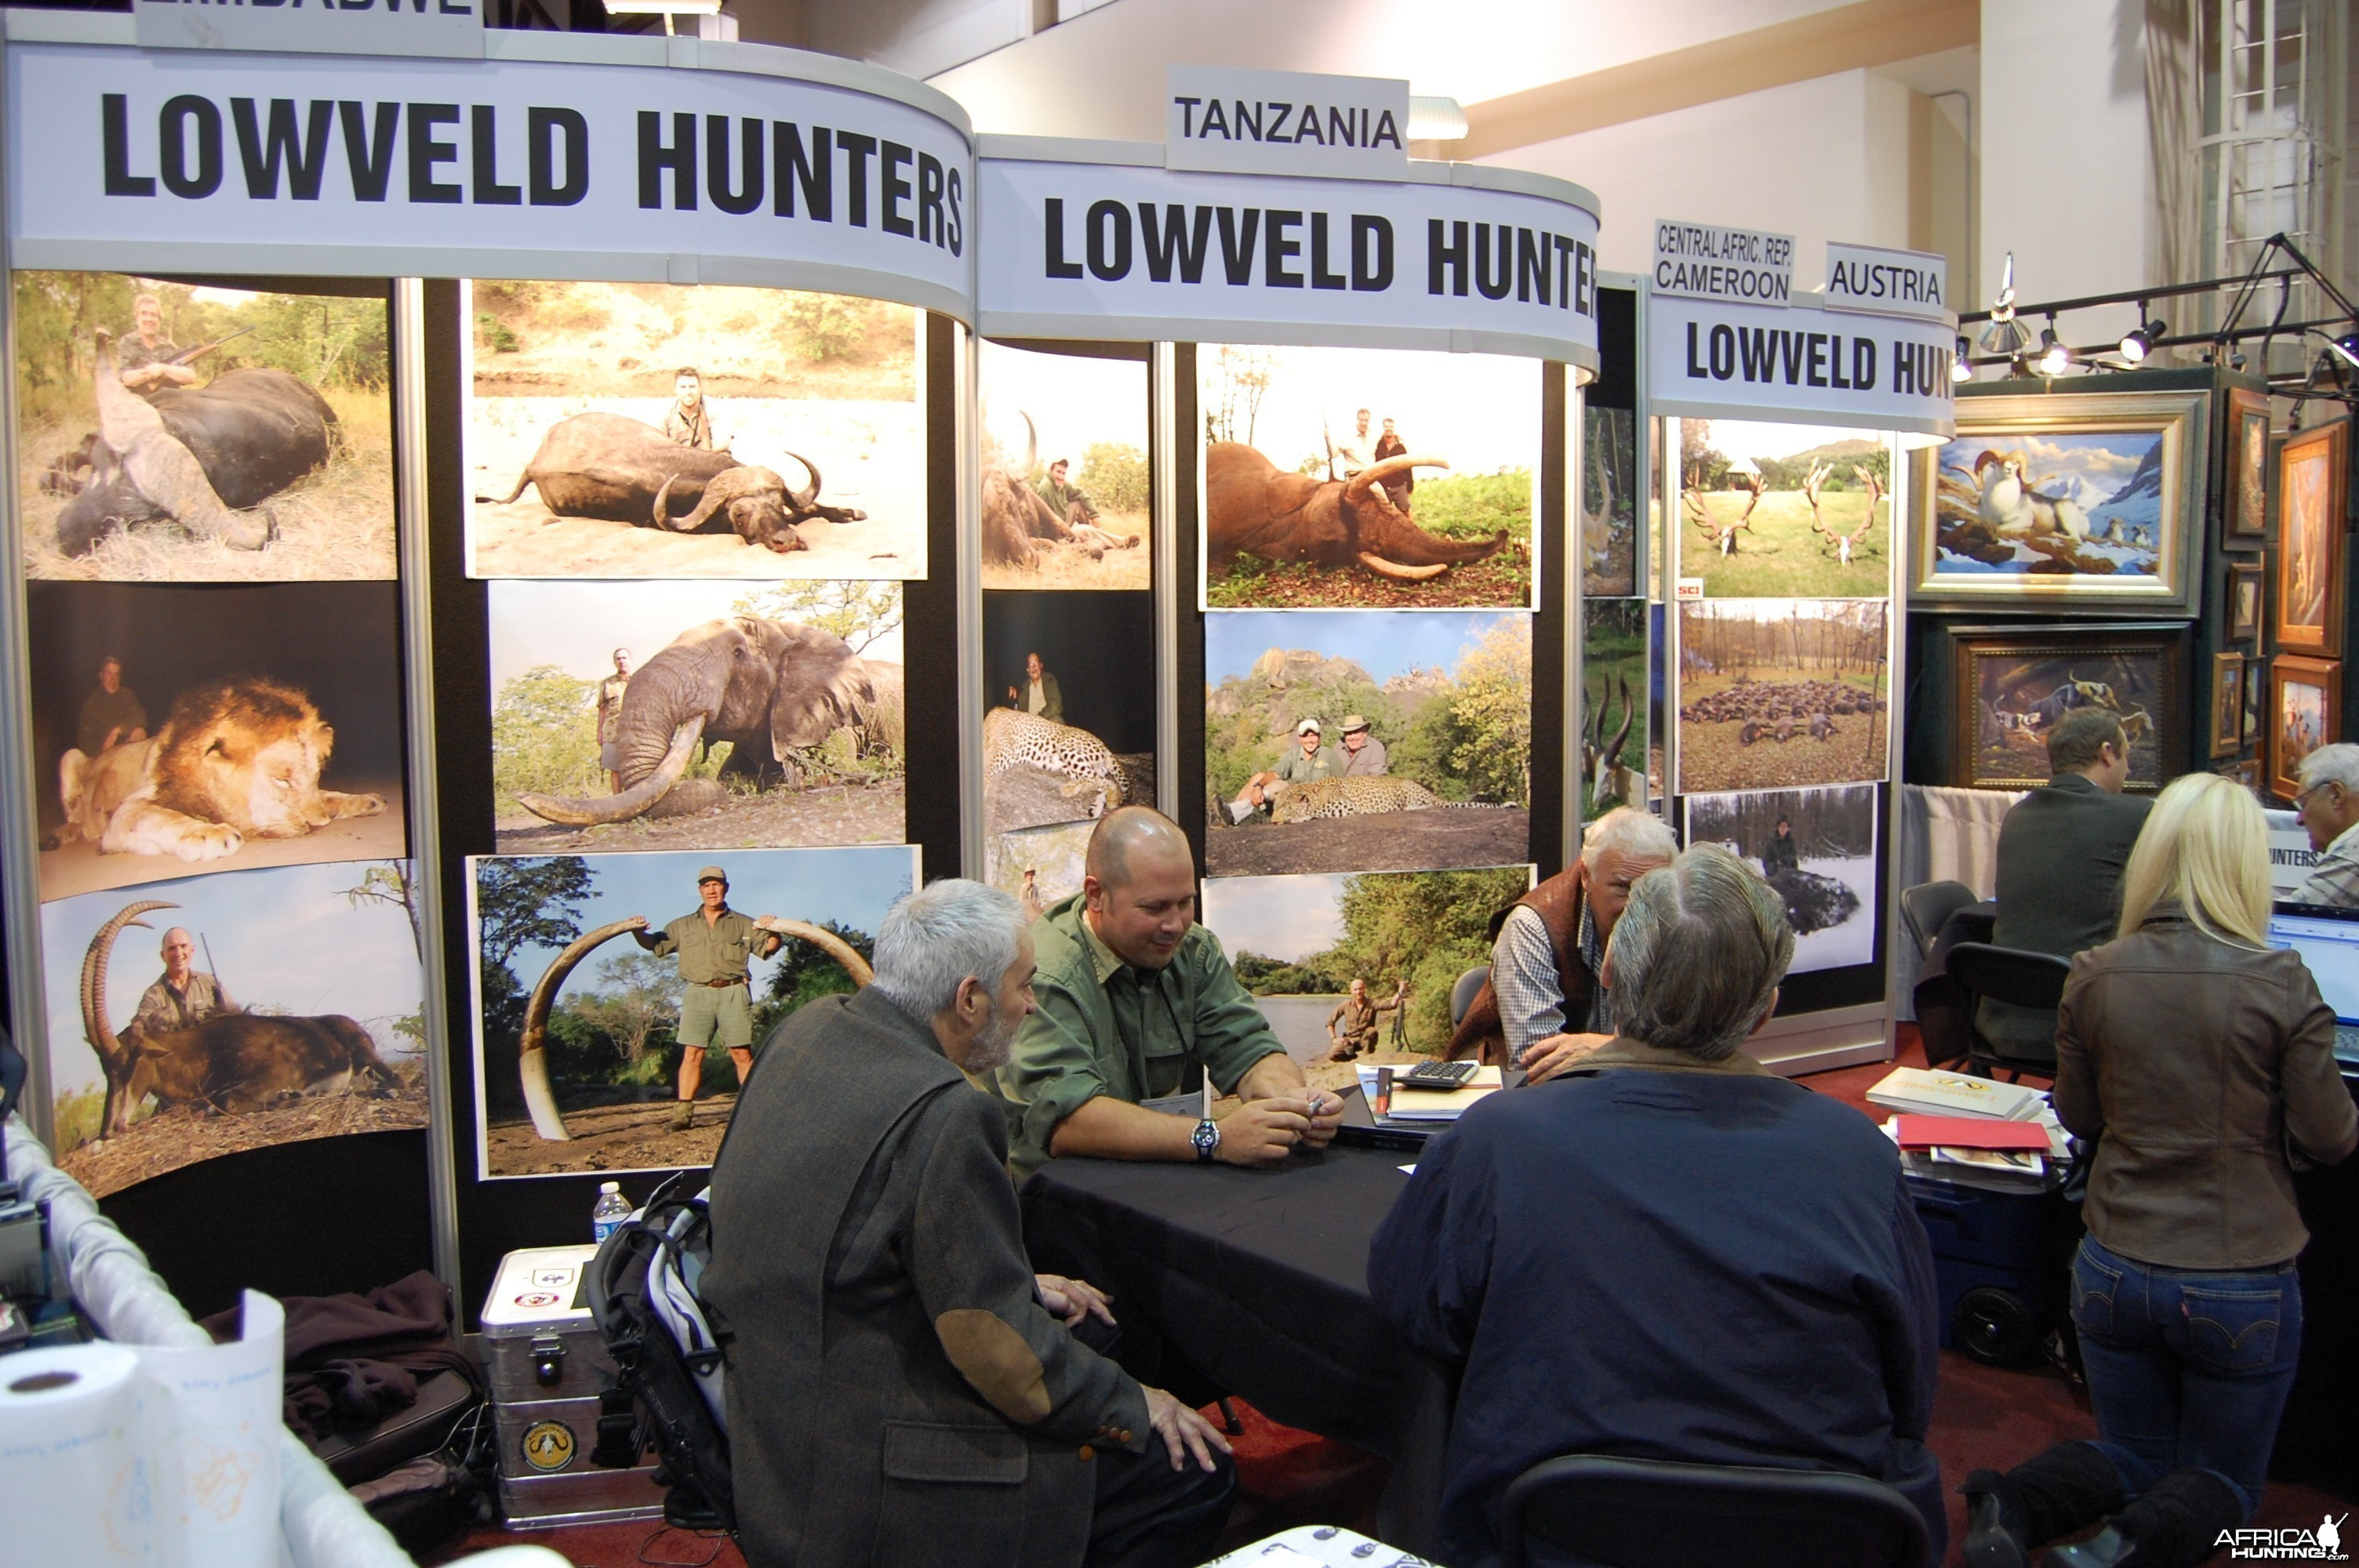 Lowveld Hunters